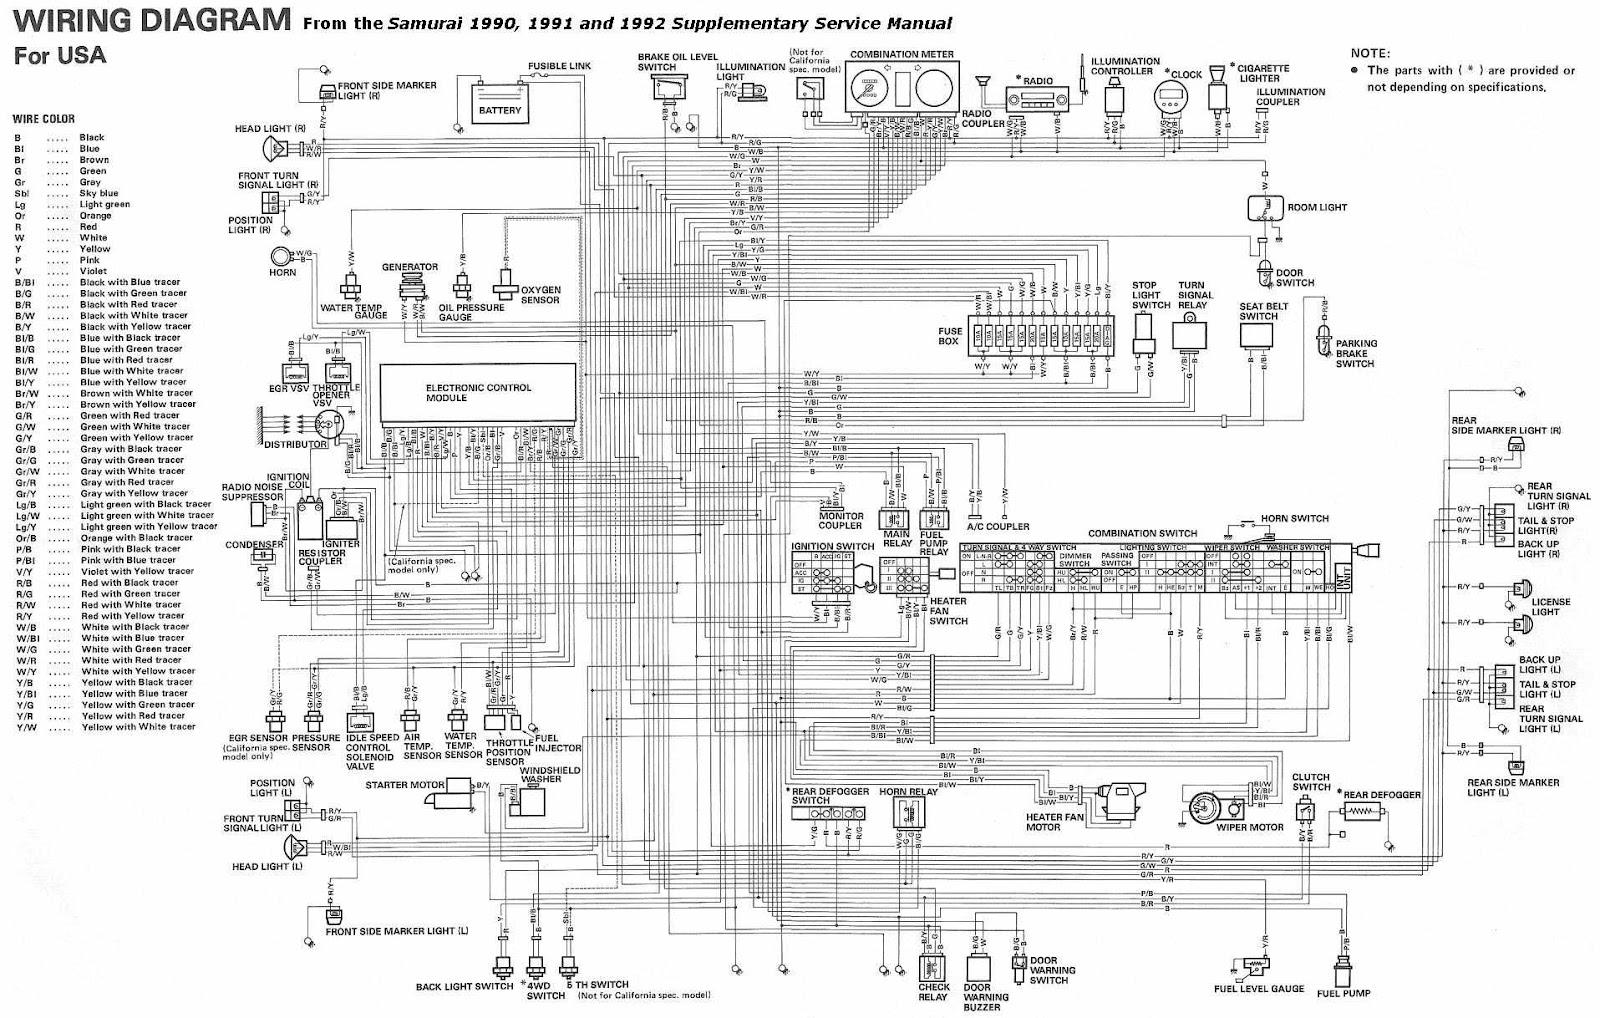 Miraculous Suzuki Vitara 16V 1997 Wiring By Diagram Suzuki Forums Suzuki Wiring Cloud Timewinrebemohammedshrineorg